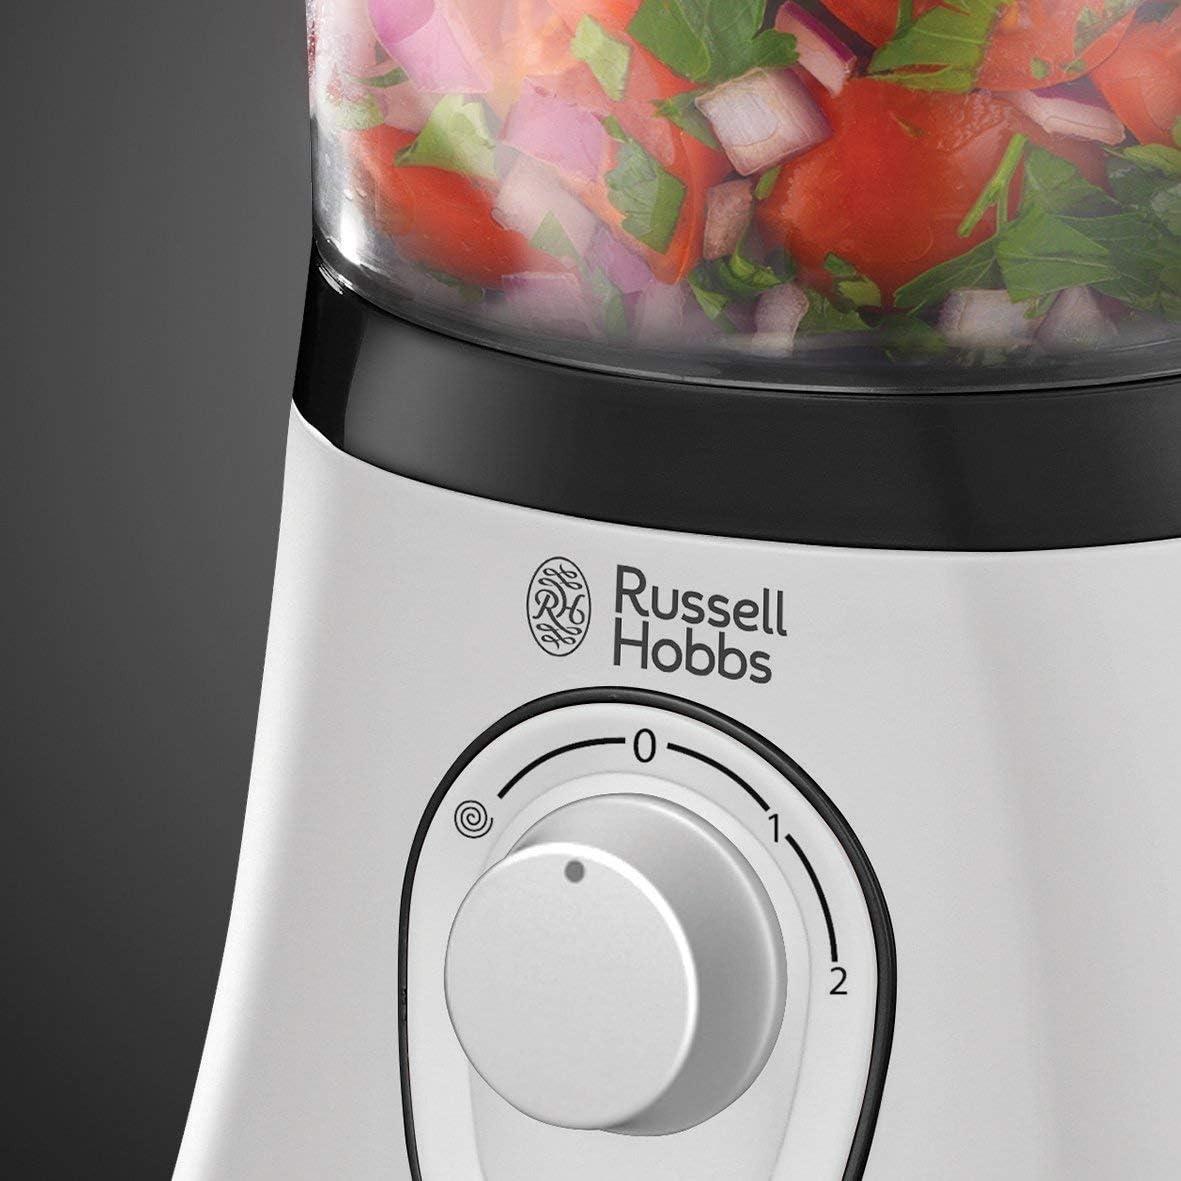 Russell Hobbs Aura 19005-56 - Procesador de alimentos de 600 W con ...